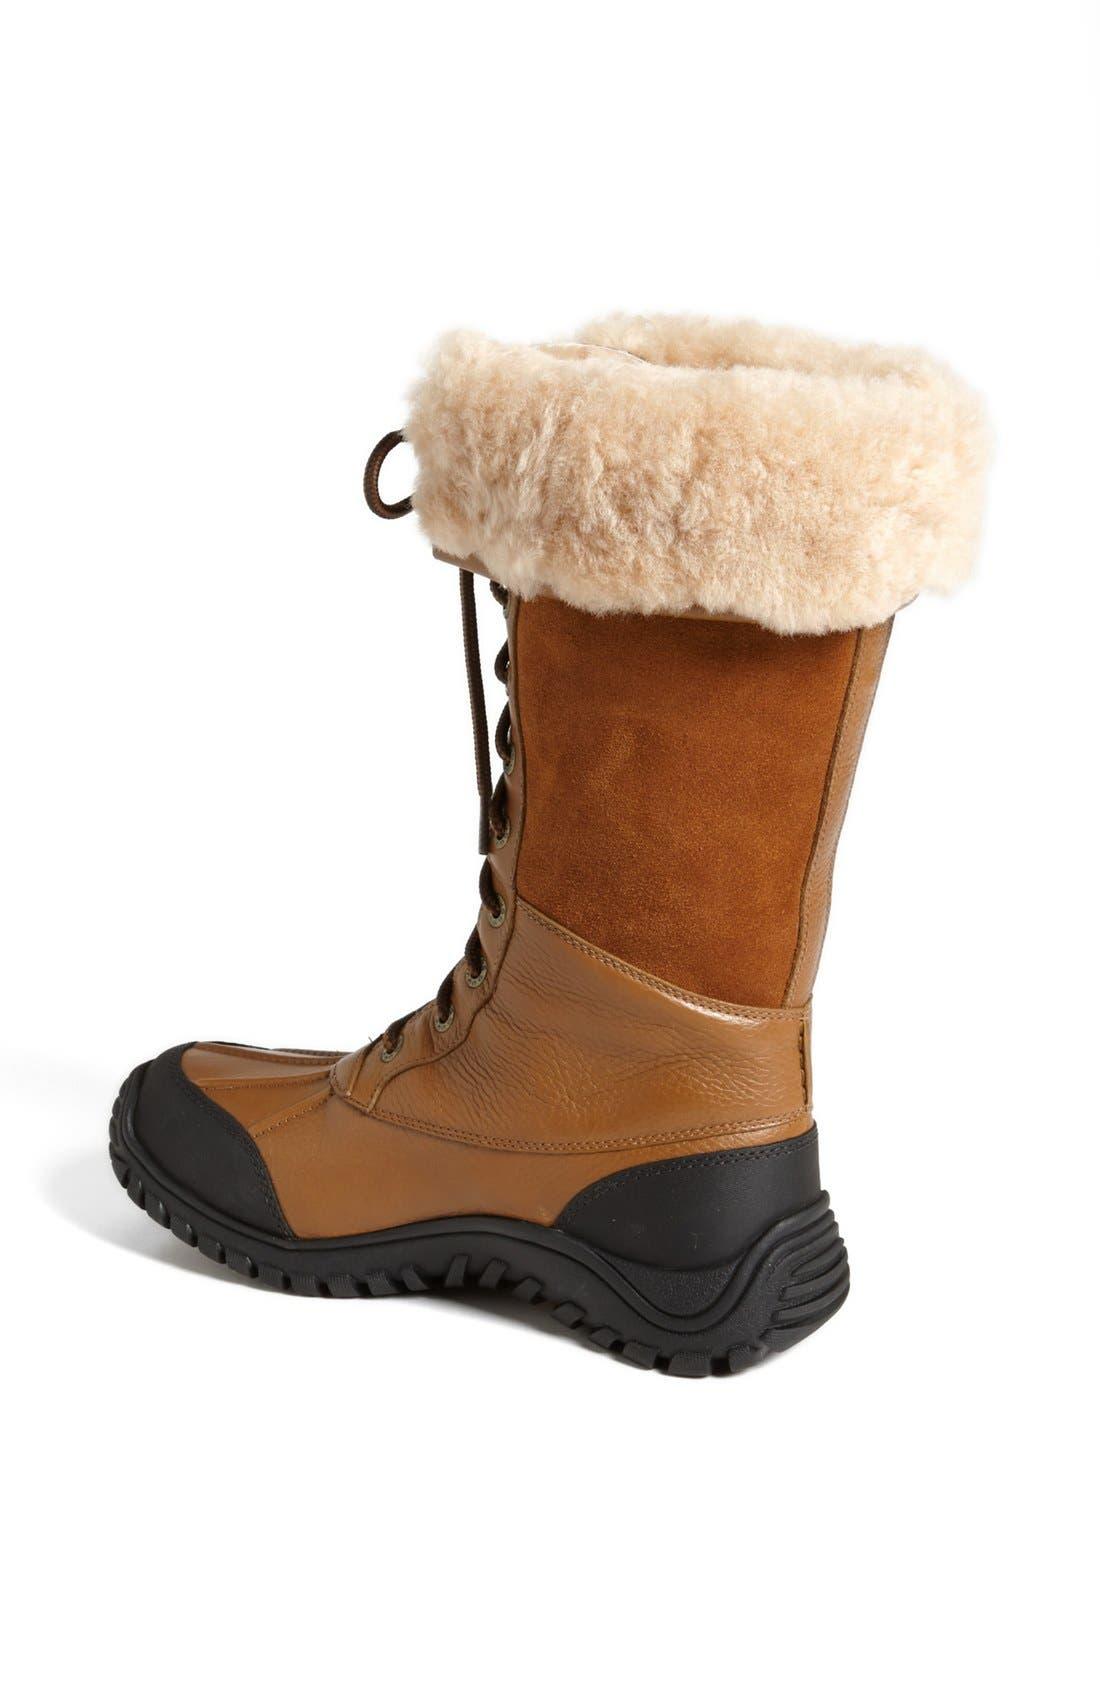 Alternate Image 2  - UGG® Adirondack Waterproof Tall Boot (Women)